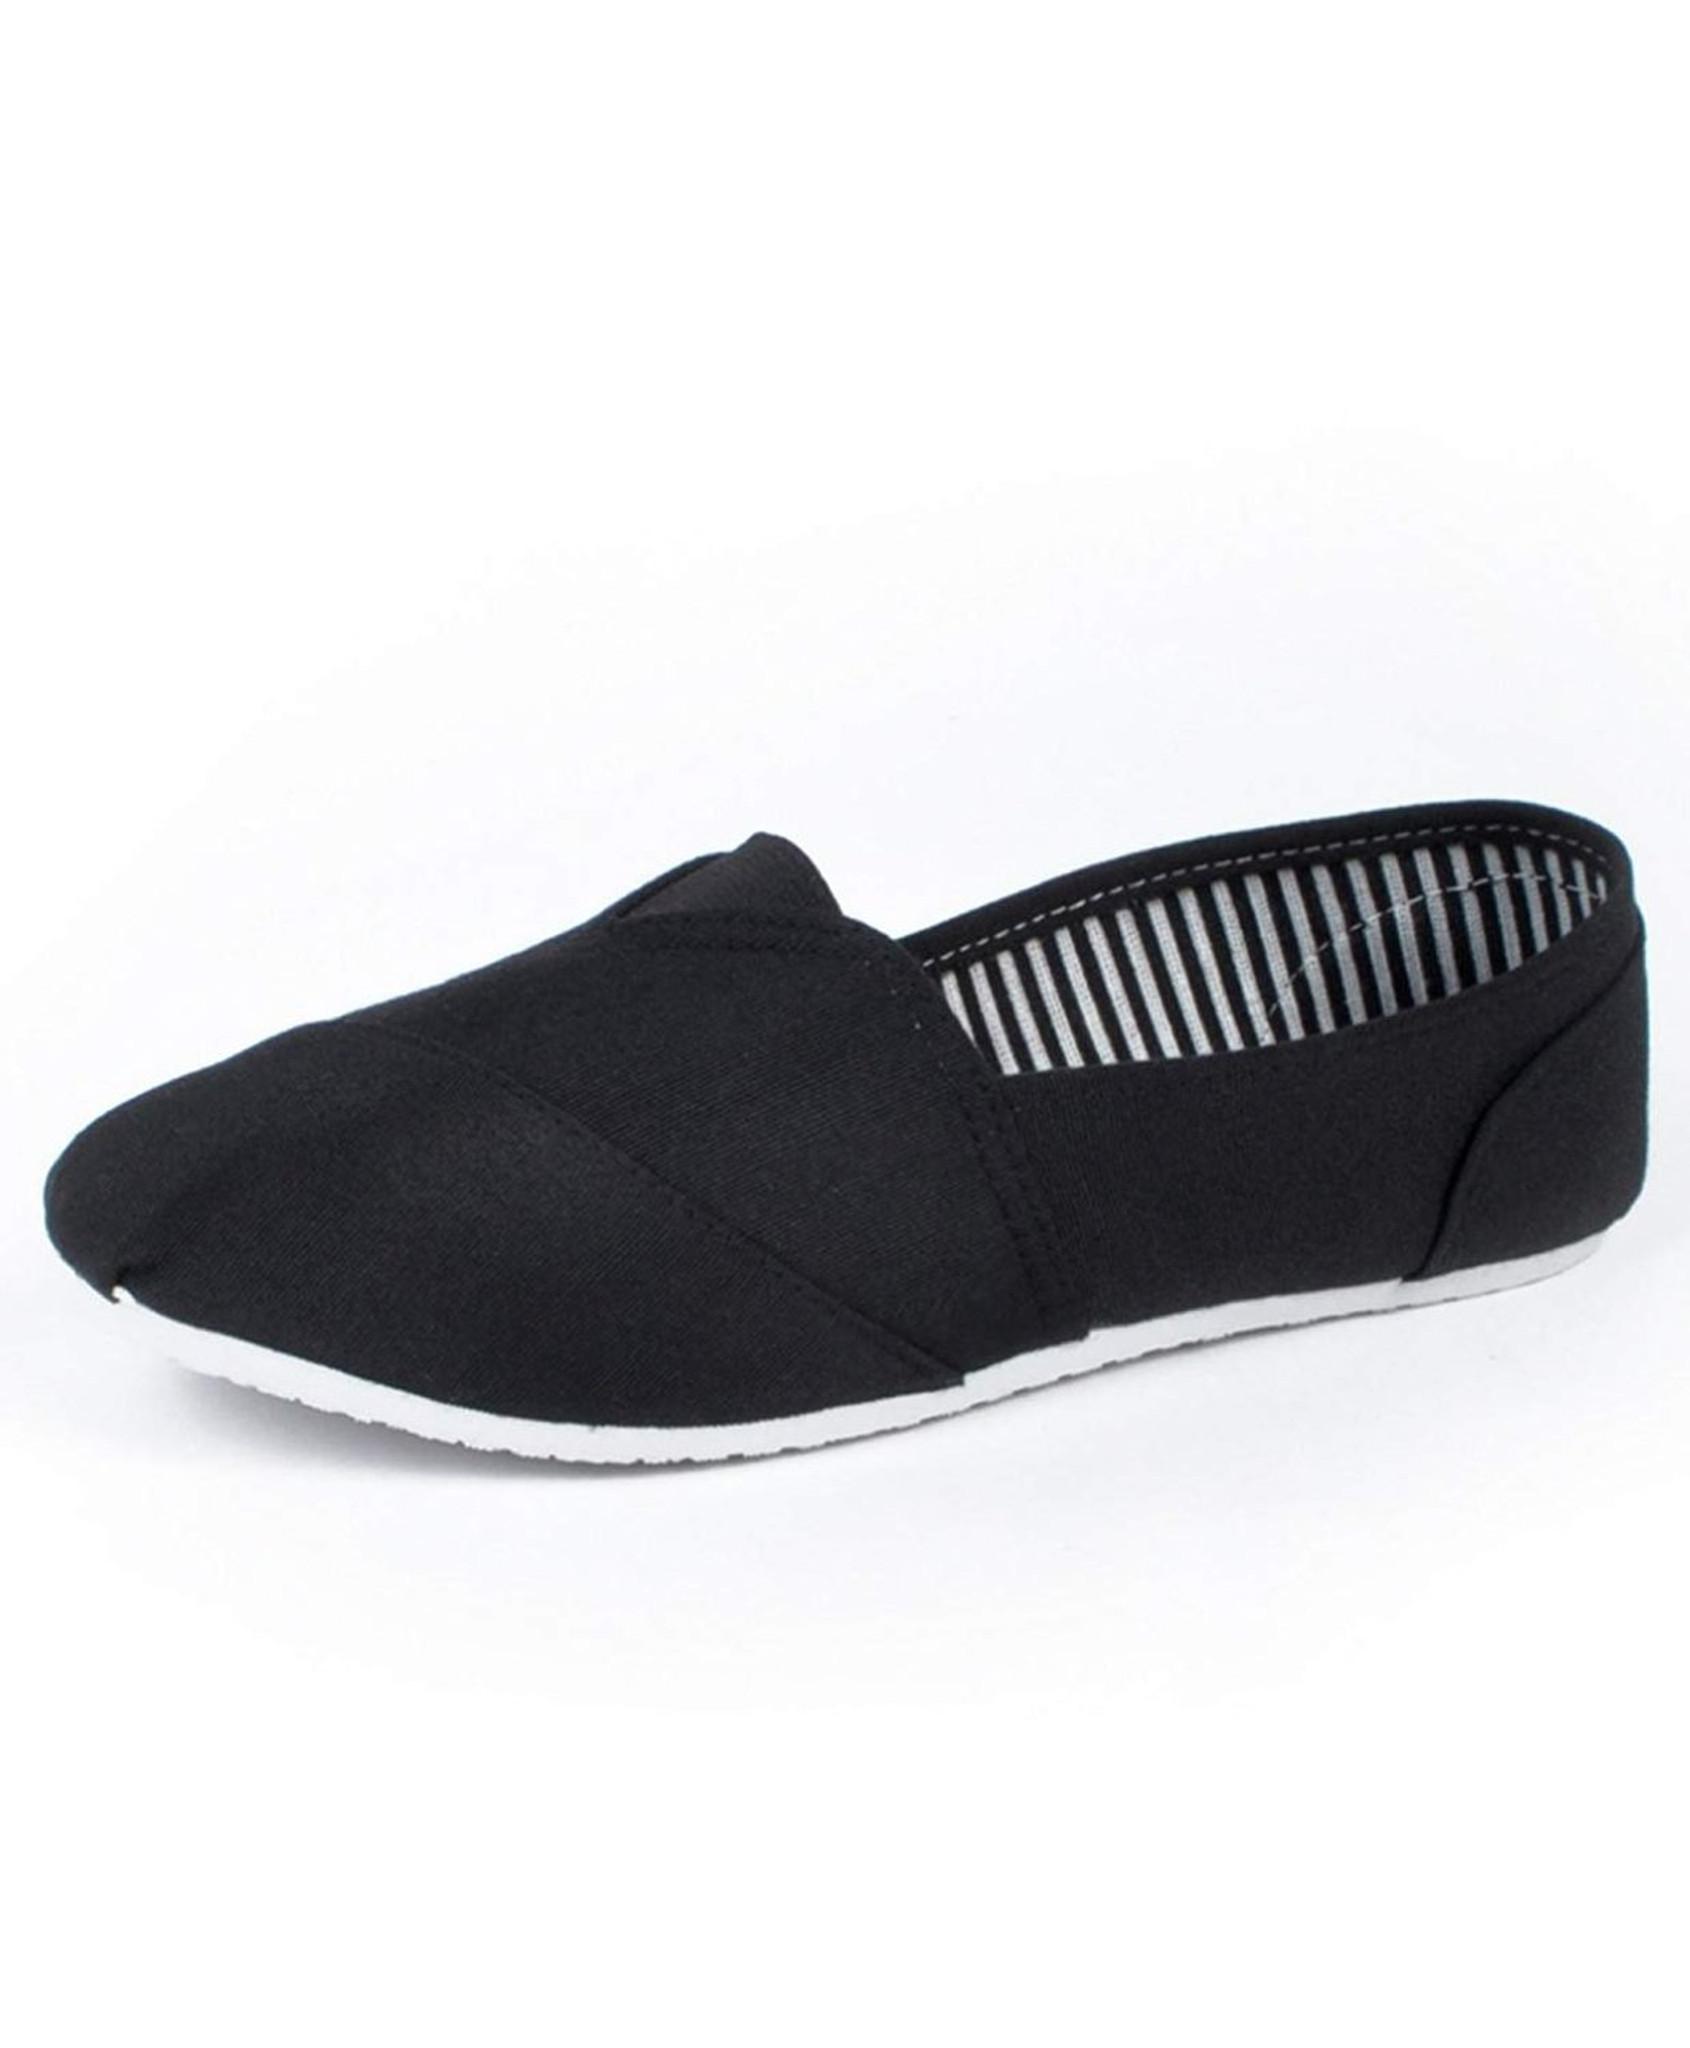 Women's Canvas Flats Slip-On Comfy Shoe